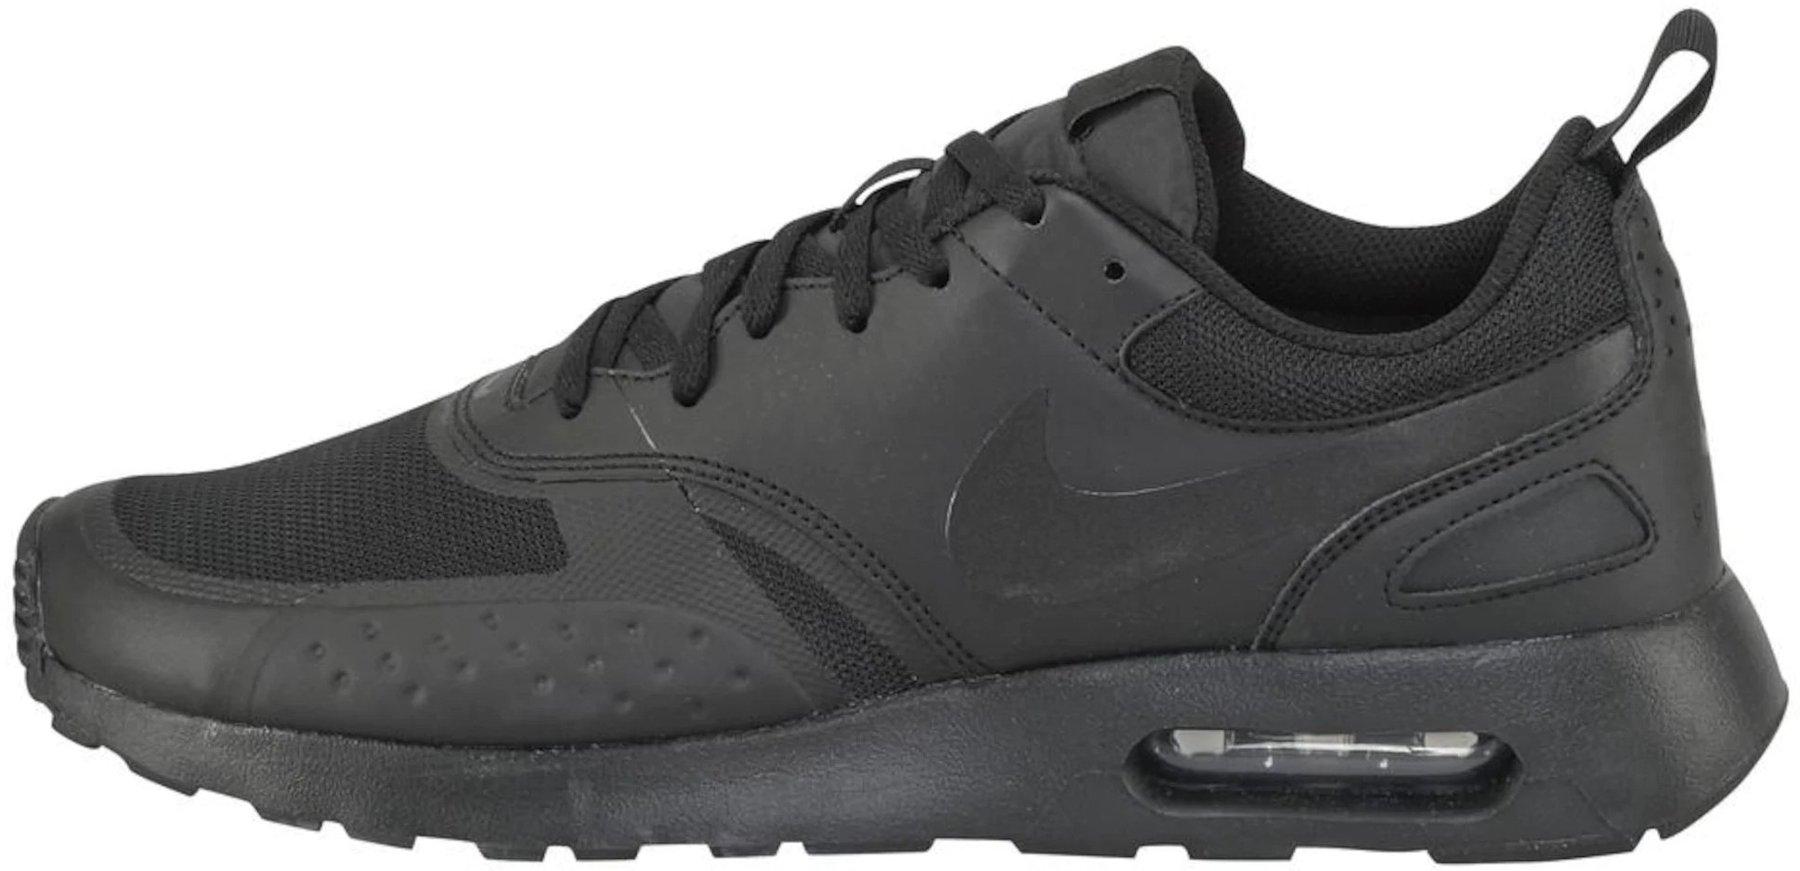 Nike Air Max Vision blackblack